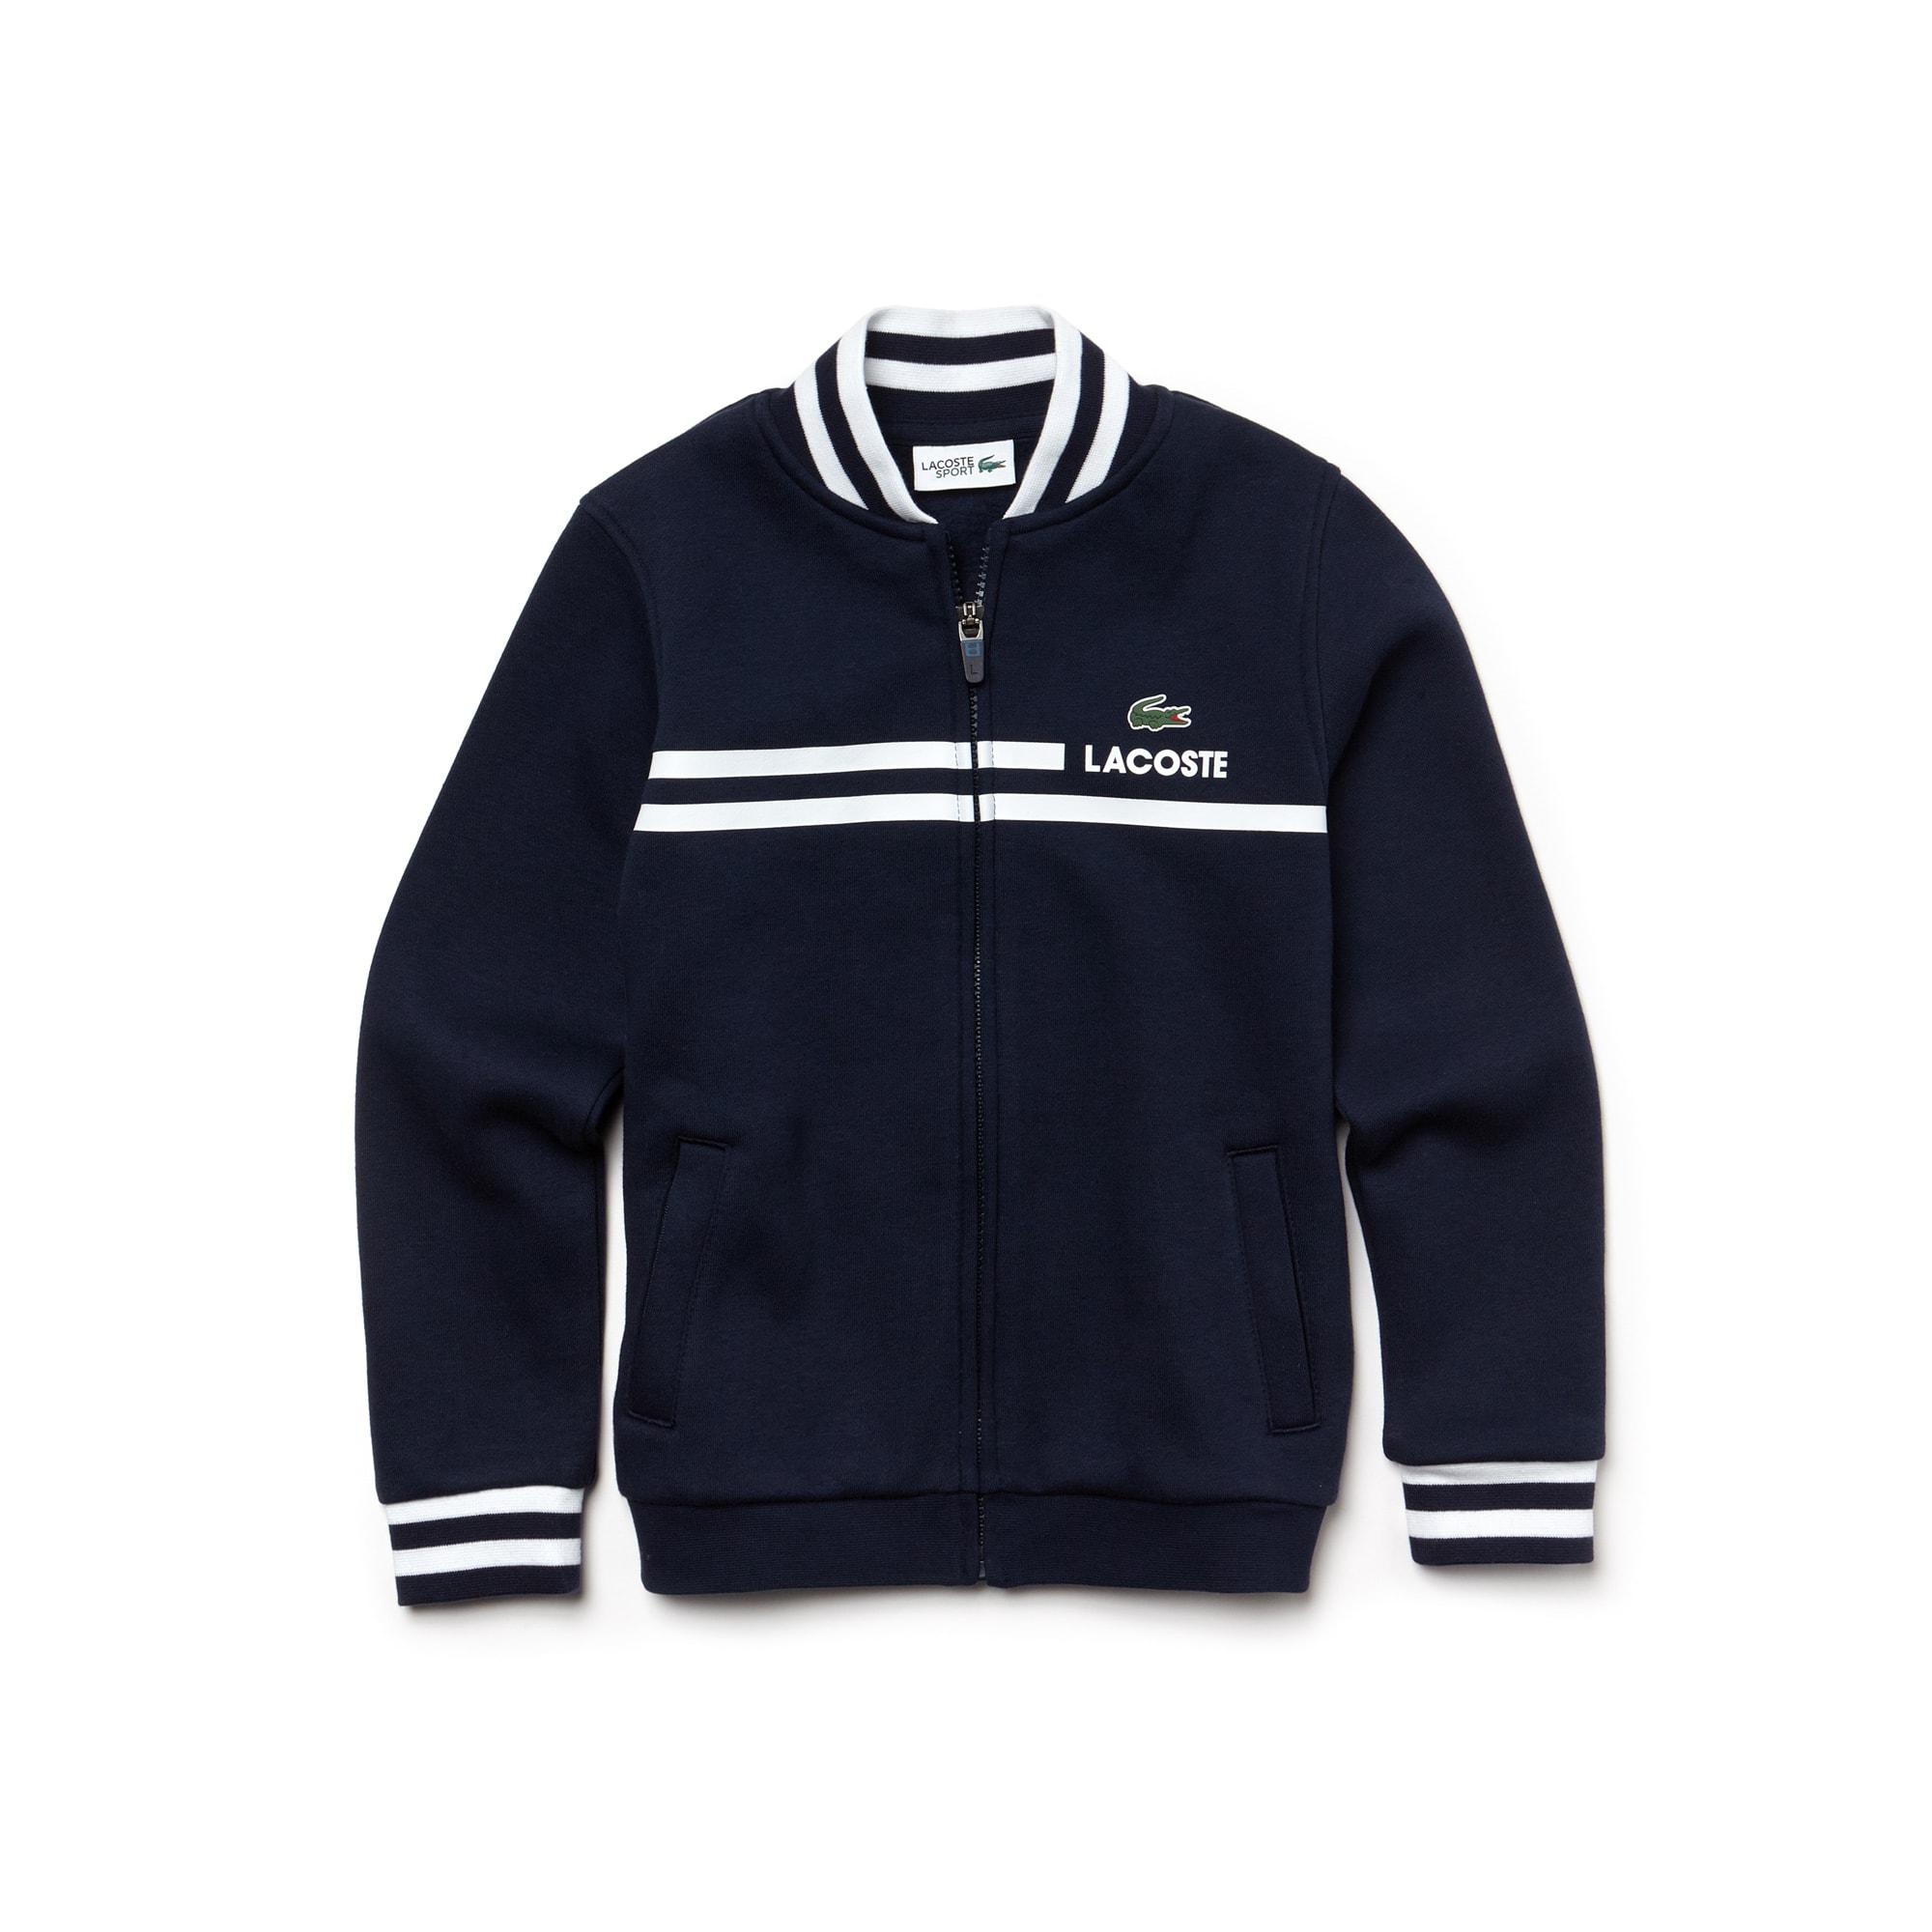 Boys Lacoste Sweatshirt